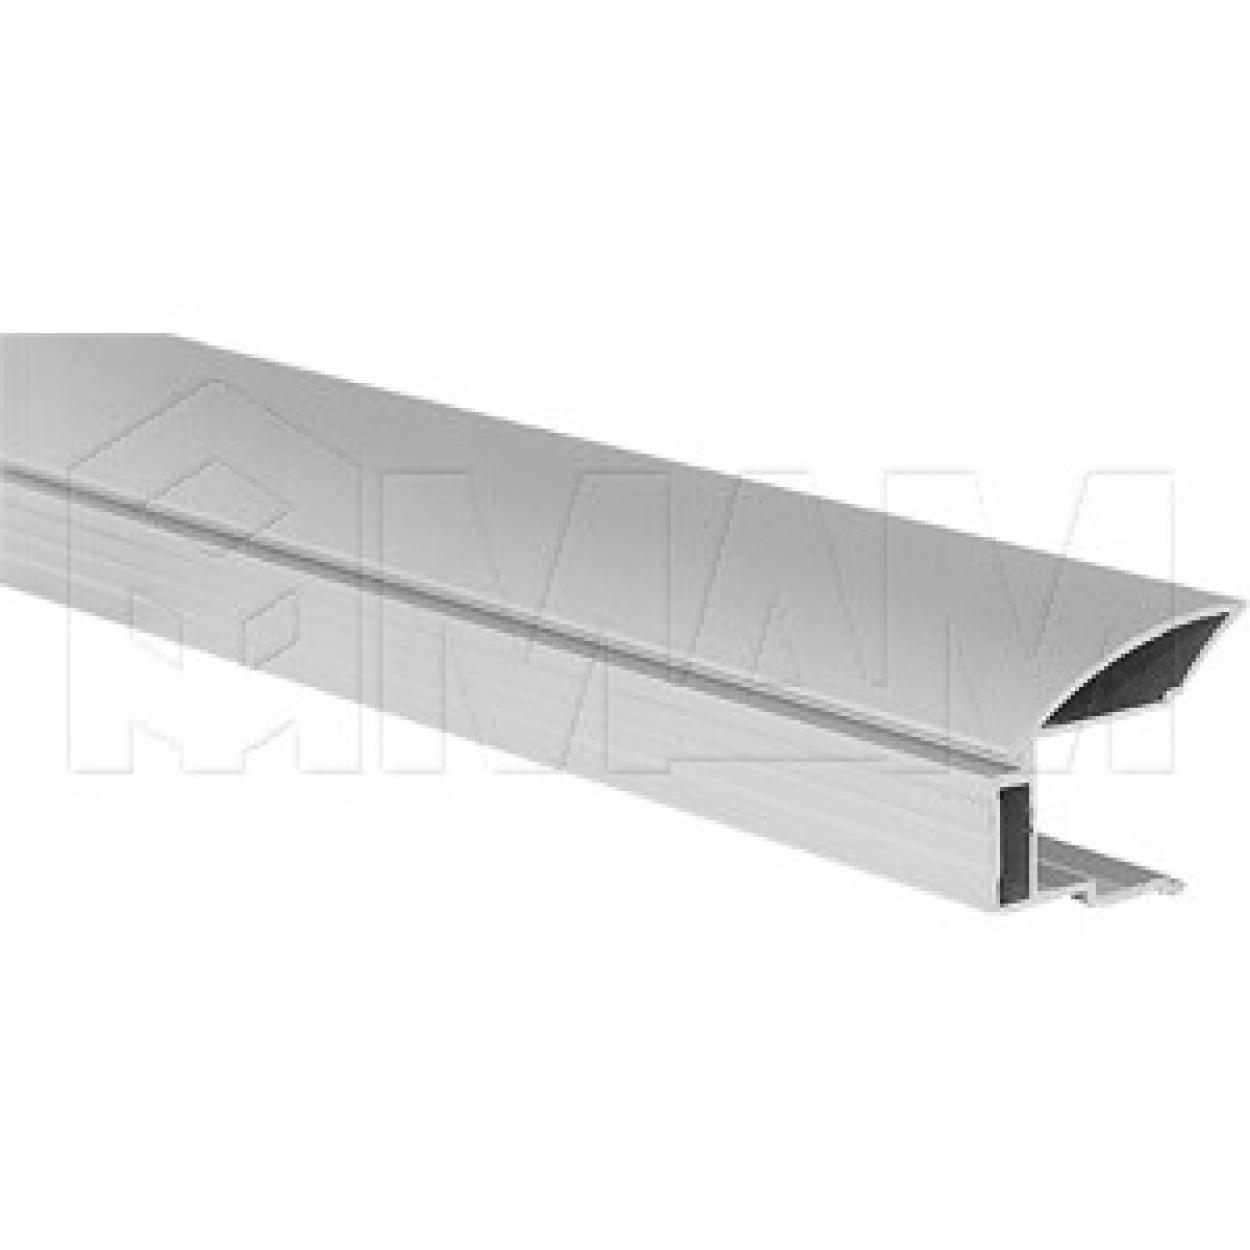 MULTIOMEGA Профиль-ручка для фасада 16 - 18 мм, серебро, L-2750